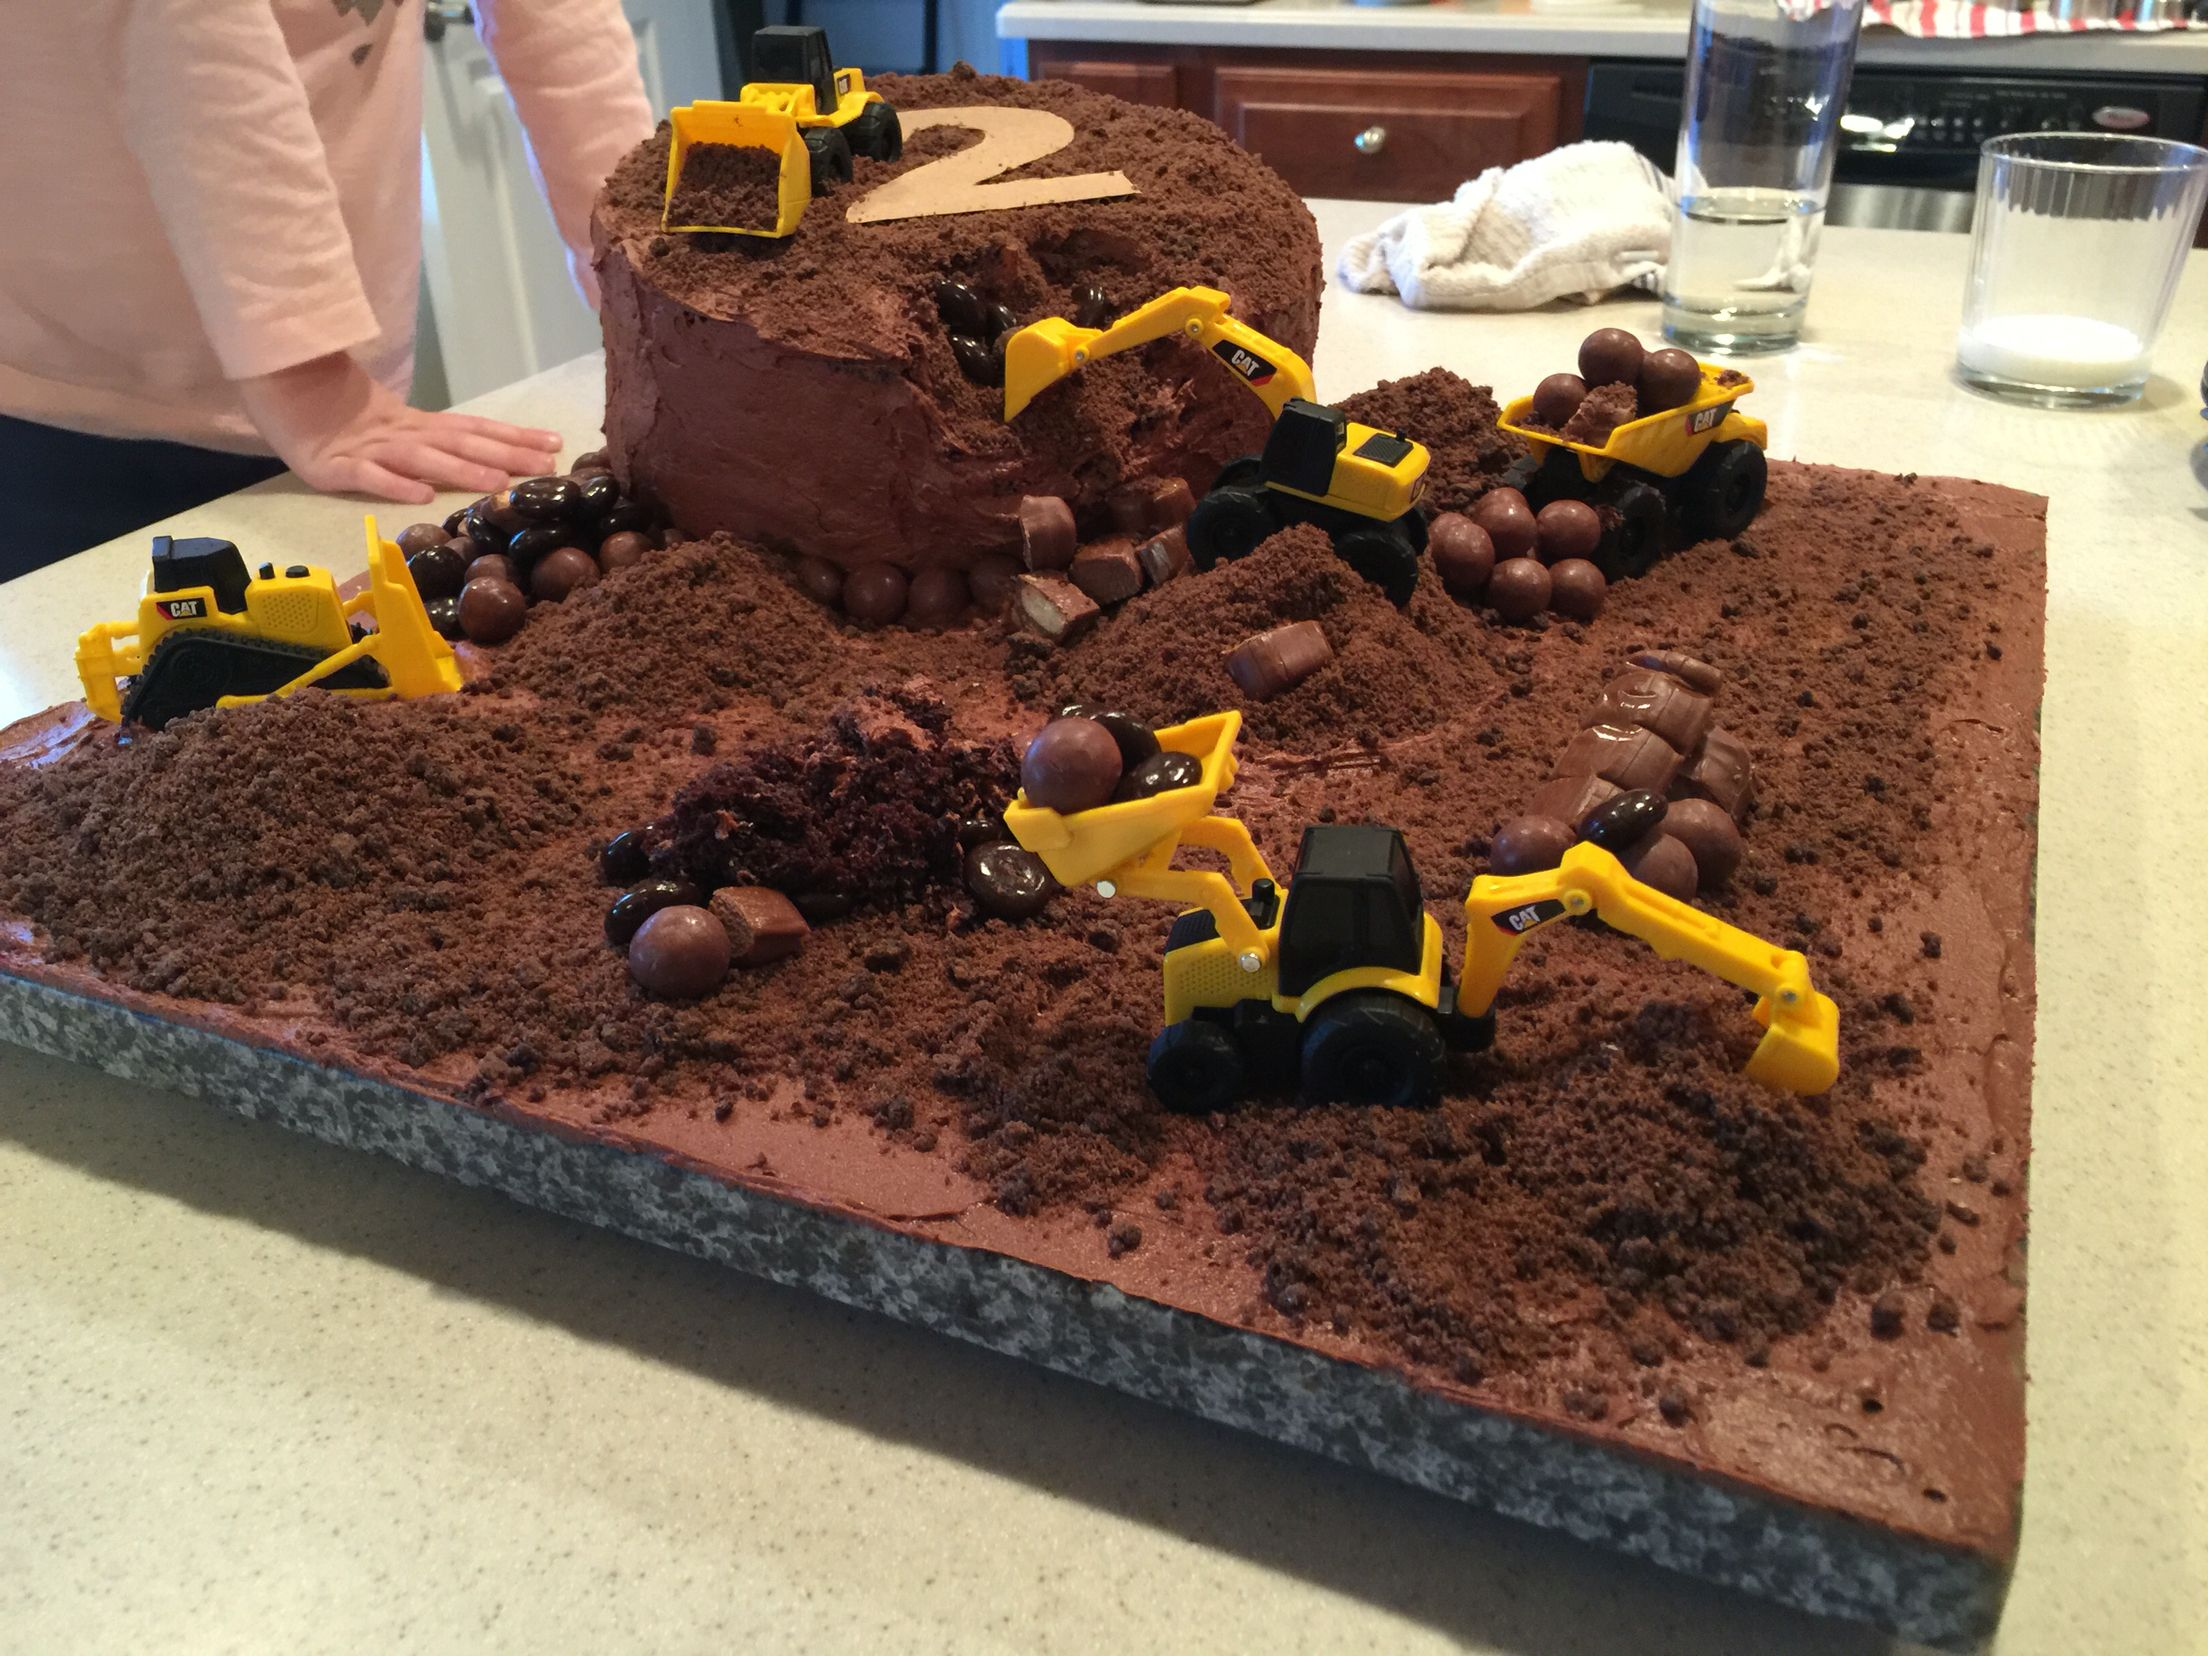 Birthday cake idea from my sister in law. #birthdaycake #dirtcake #case #tonka